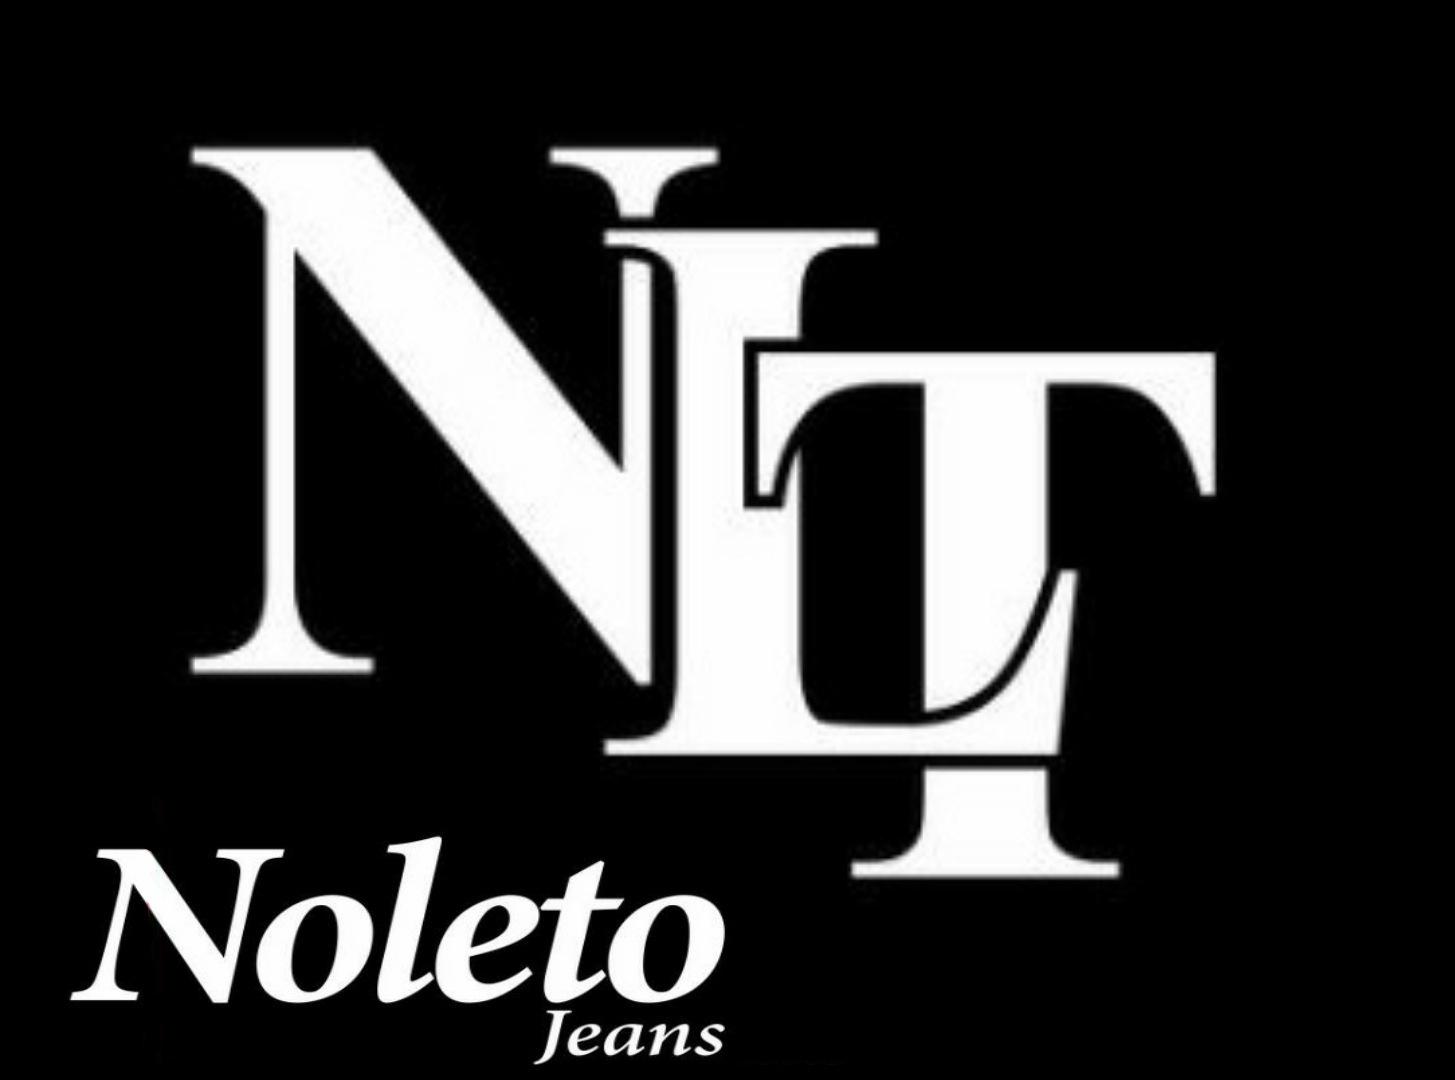 Noleto Jeans